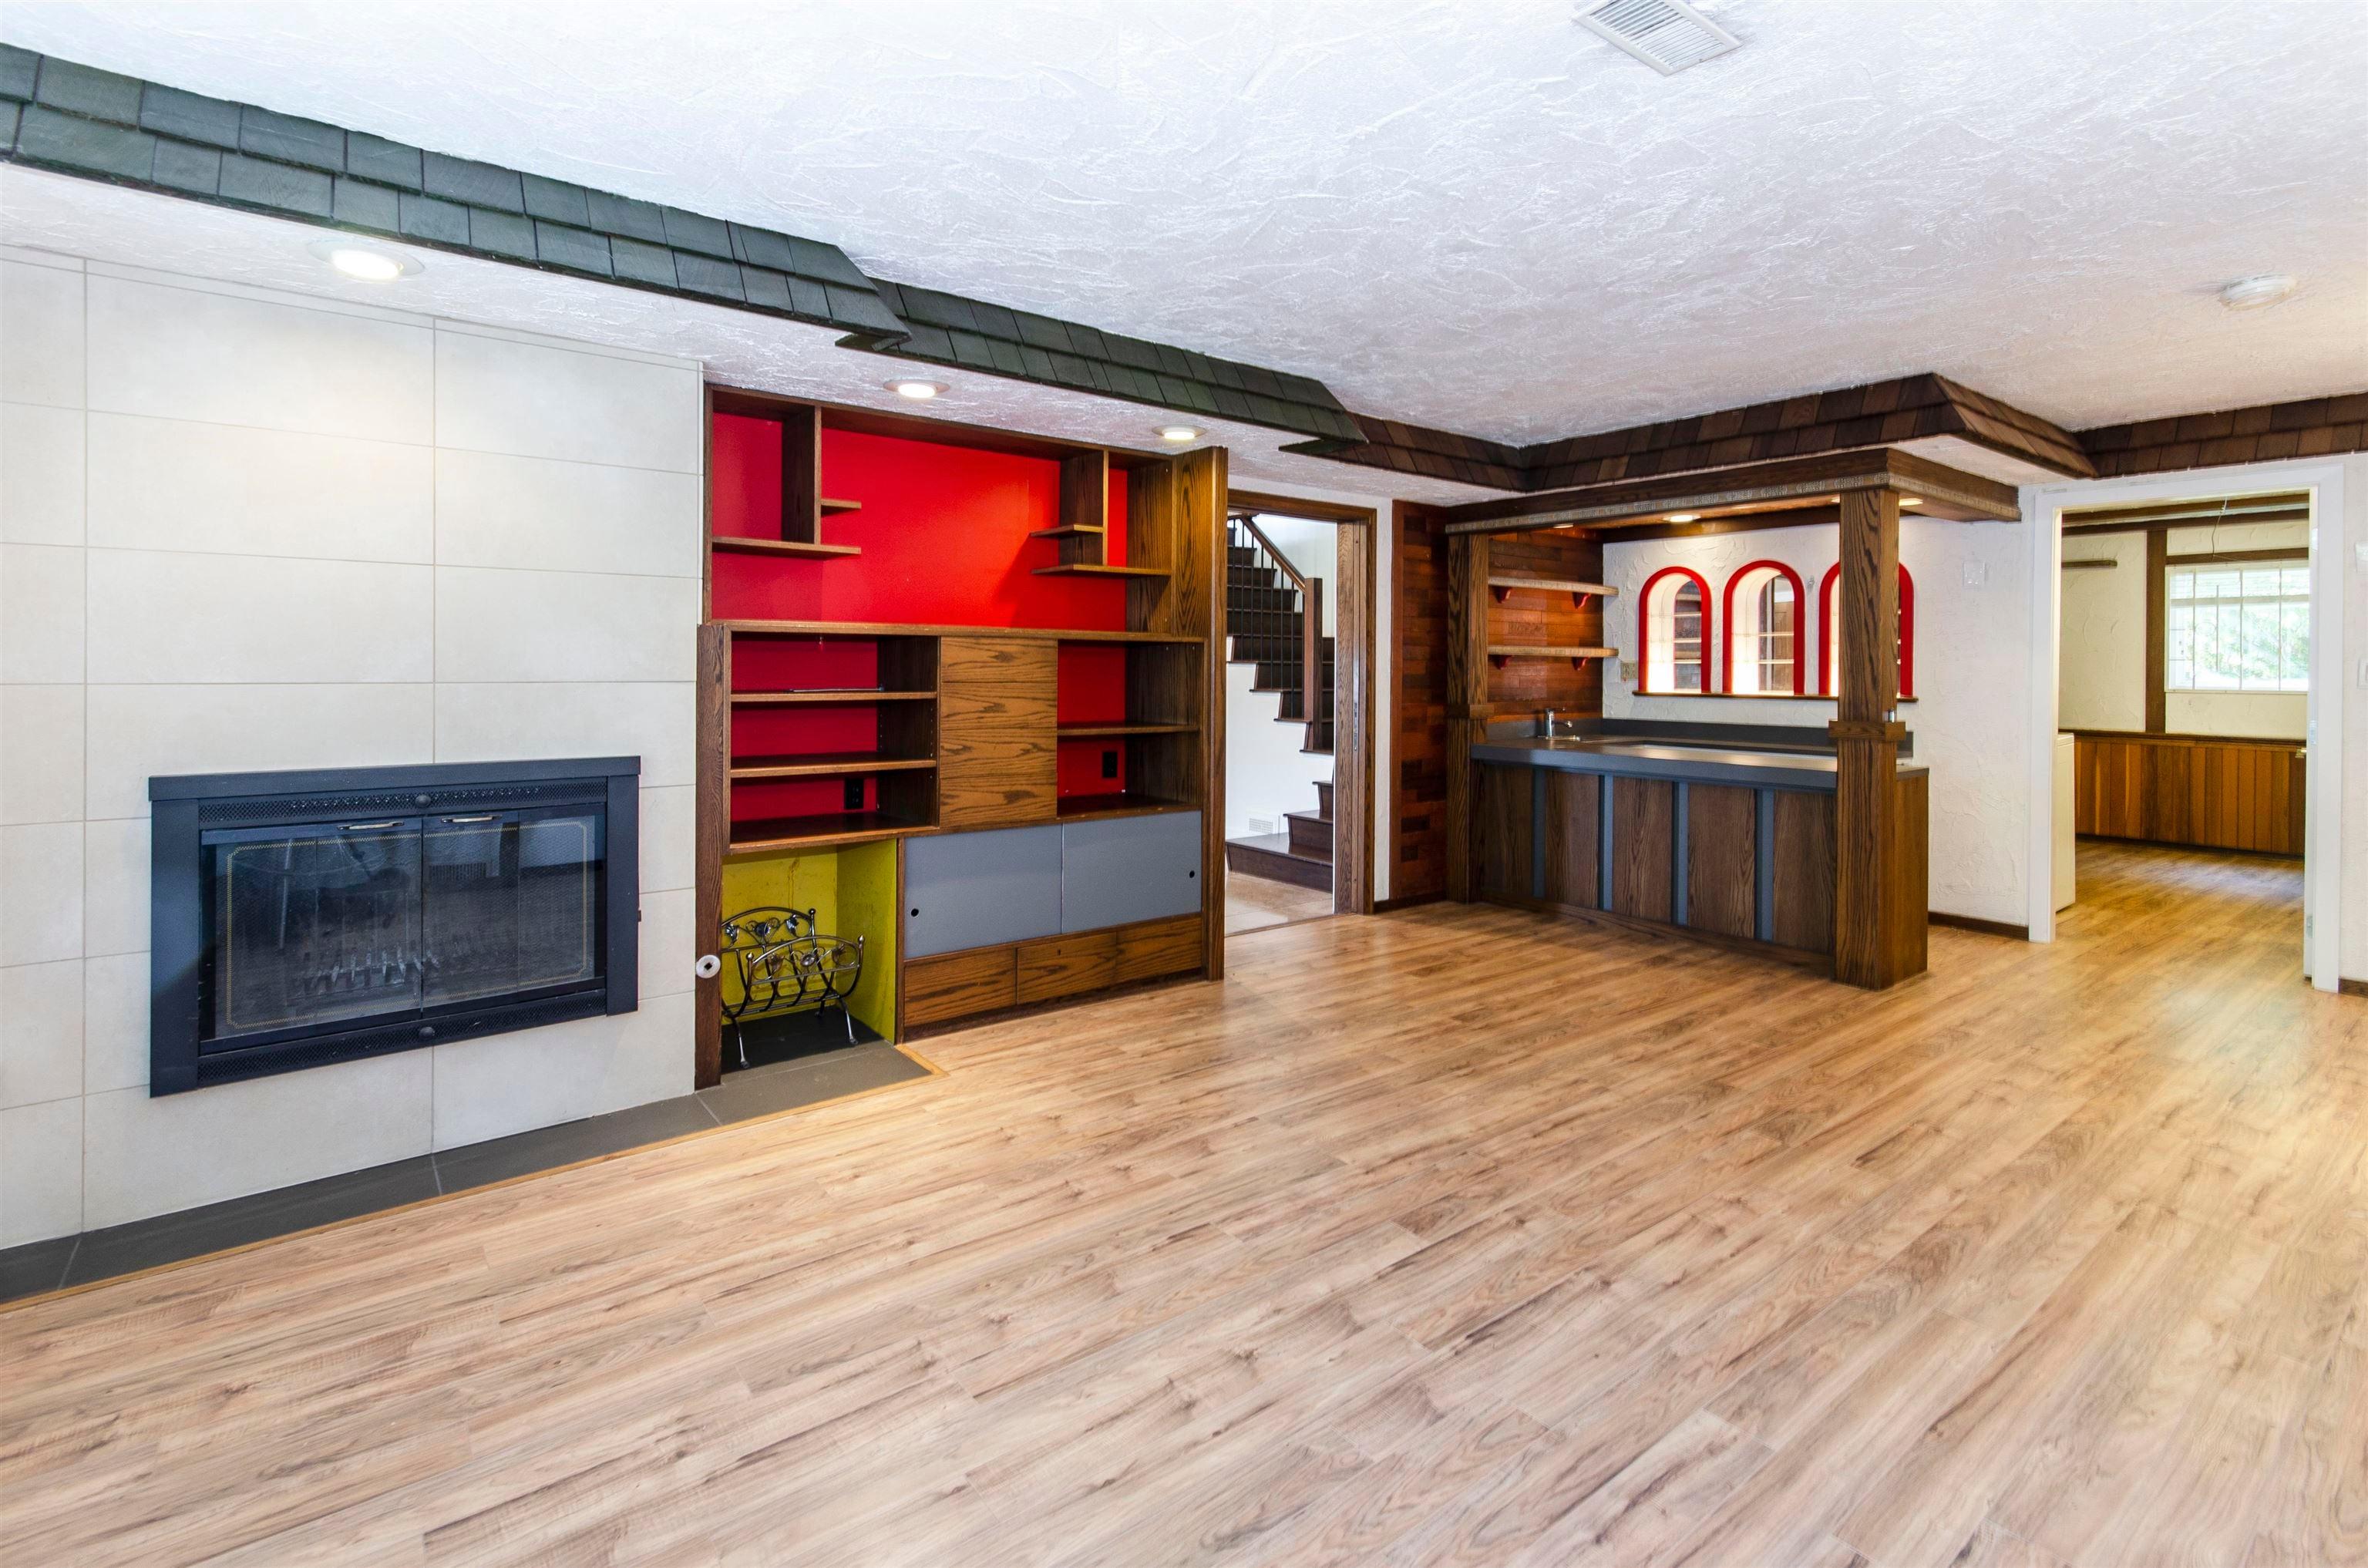 3785 REGENT AVENUE - Upper Lonsdale House/Single Family for sale, 4 Bedrooms (R2617648) - #3